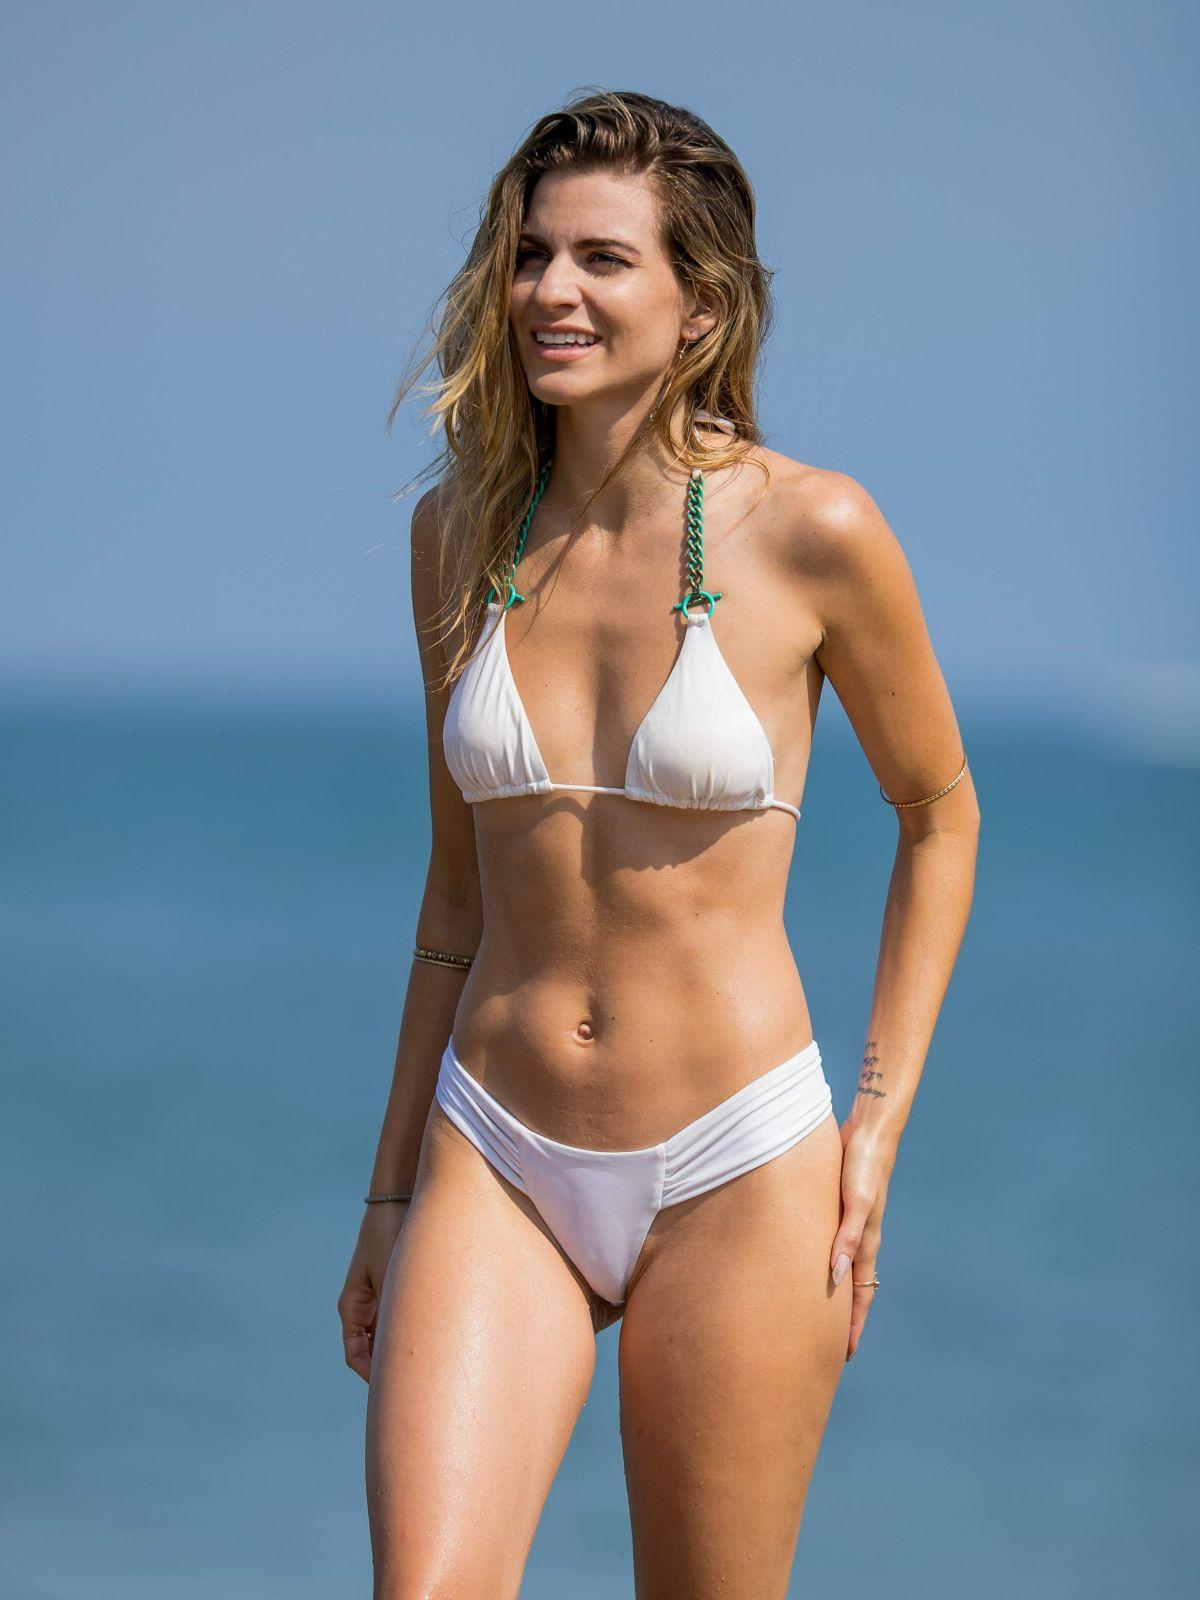 rachel mccord in bikini at a beach in malibu 07 30 2016